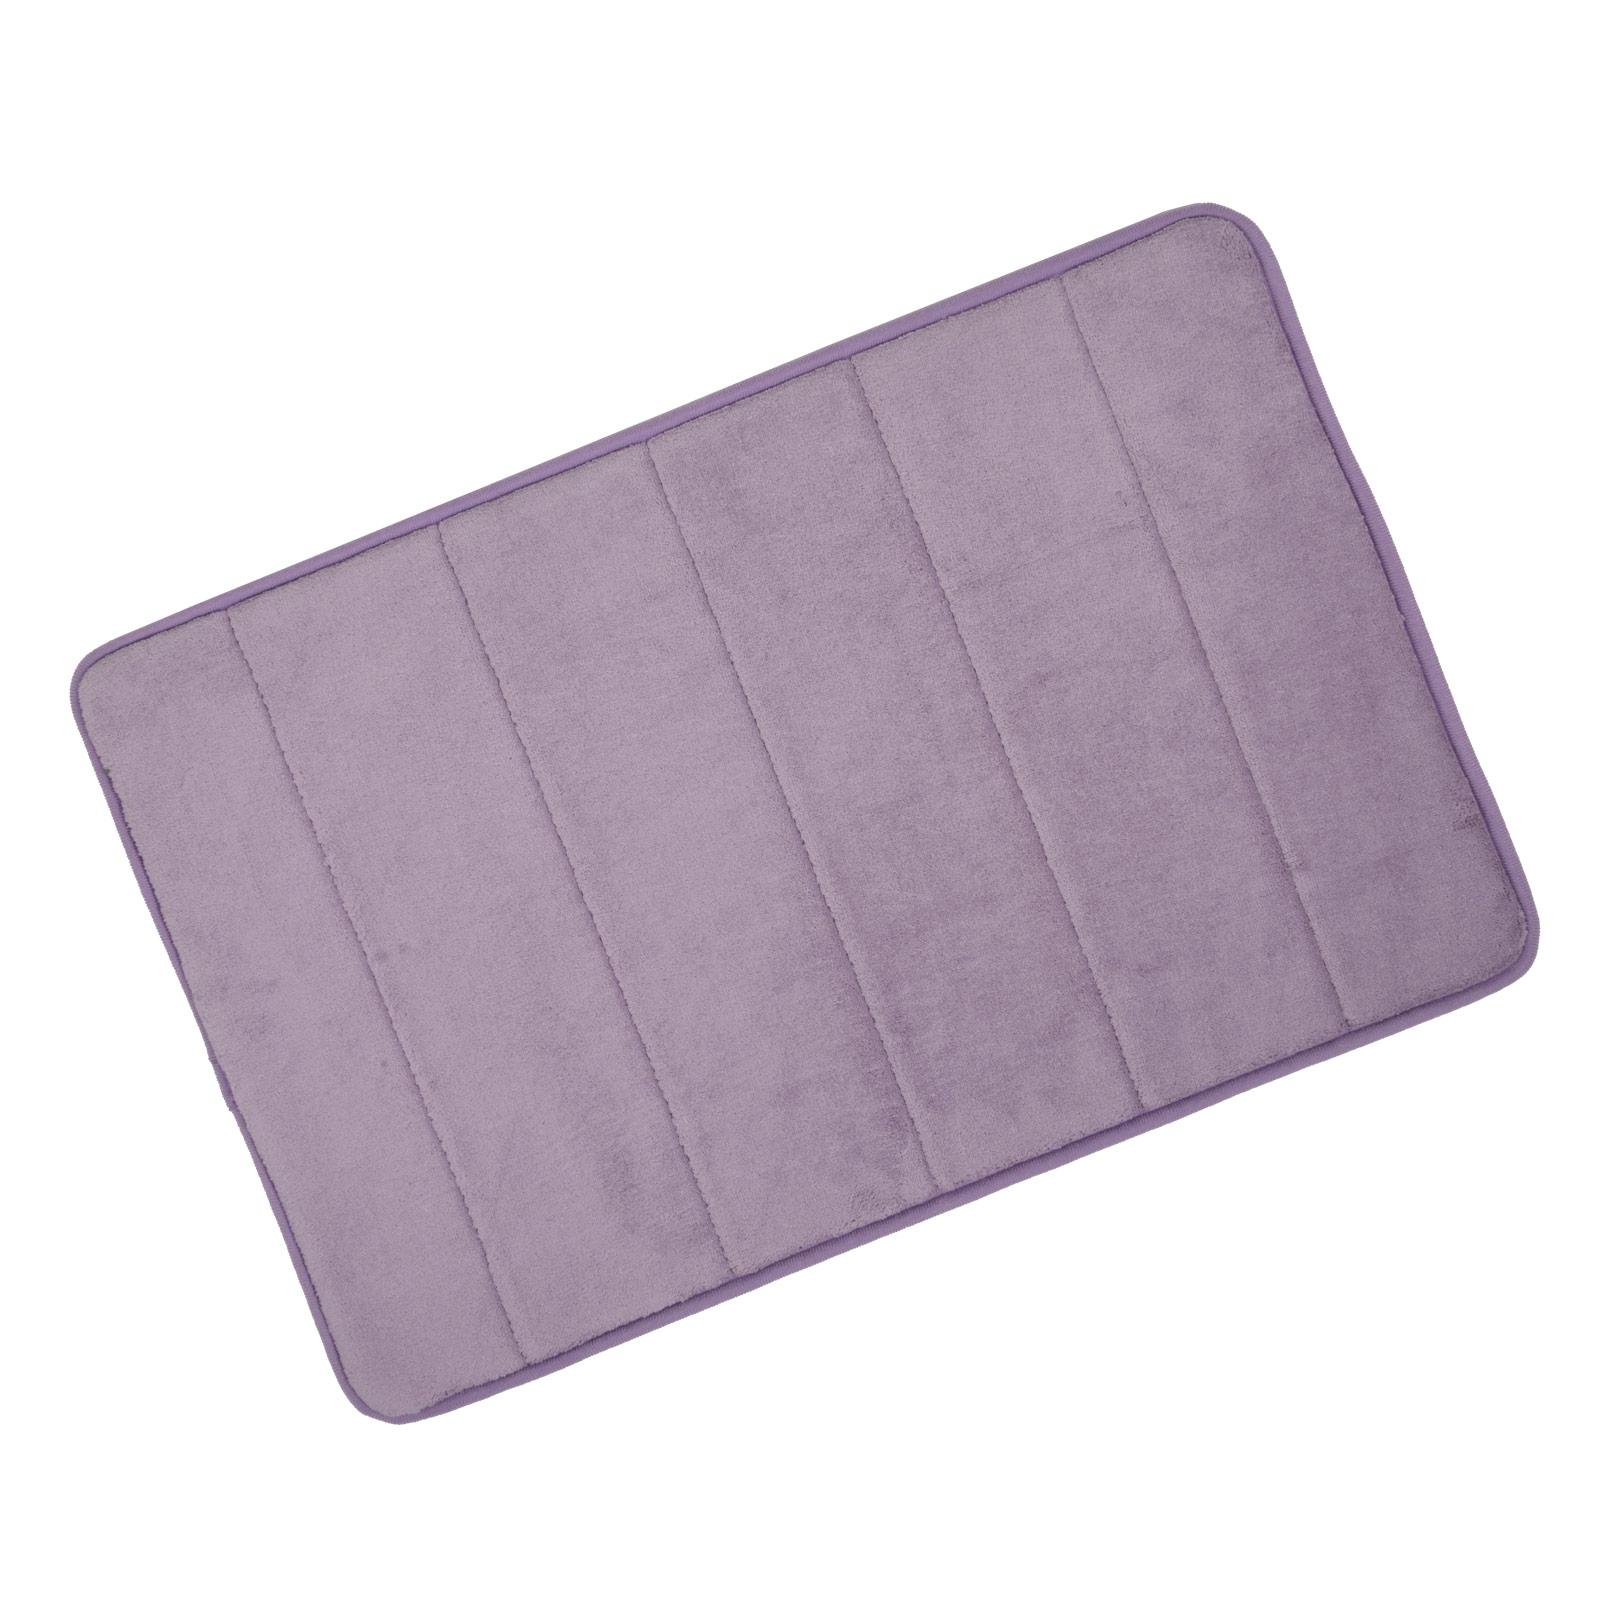 microfibre memory foam bathroom shower bath mat with non slip back picture 12 of 24